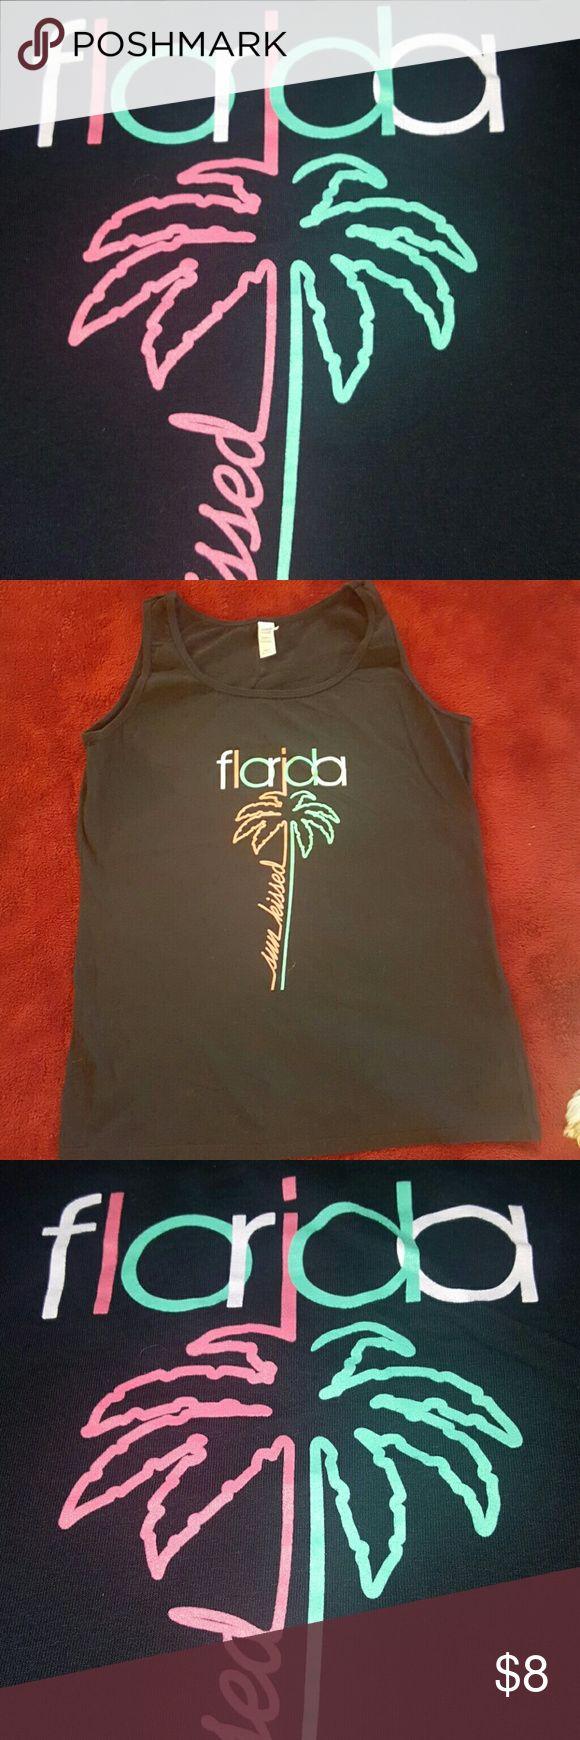 BOG2HALF 💥NEON FLORIDA TANK - BLACK Comfy Clothes 💥  TANK  Black Sun Kissed - Florida in neon colors  Ladies XL Gildan SoftStyle Tops Tank Tops